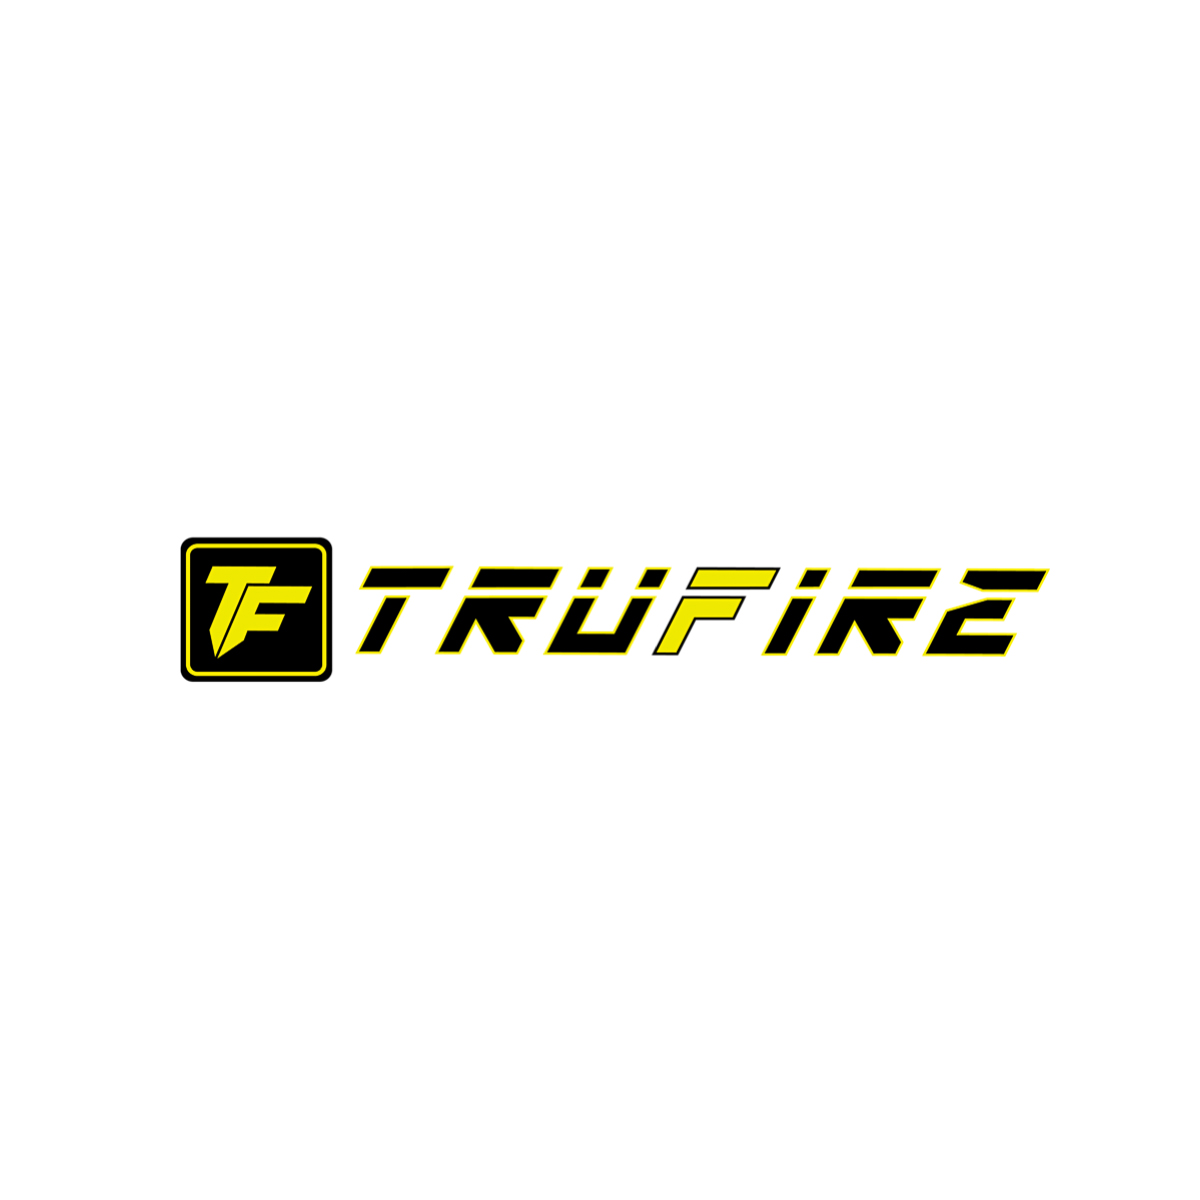 TruFire